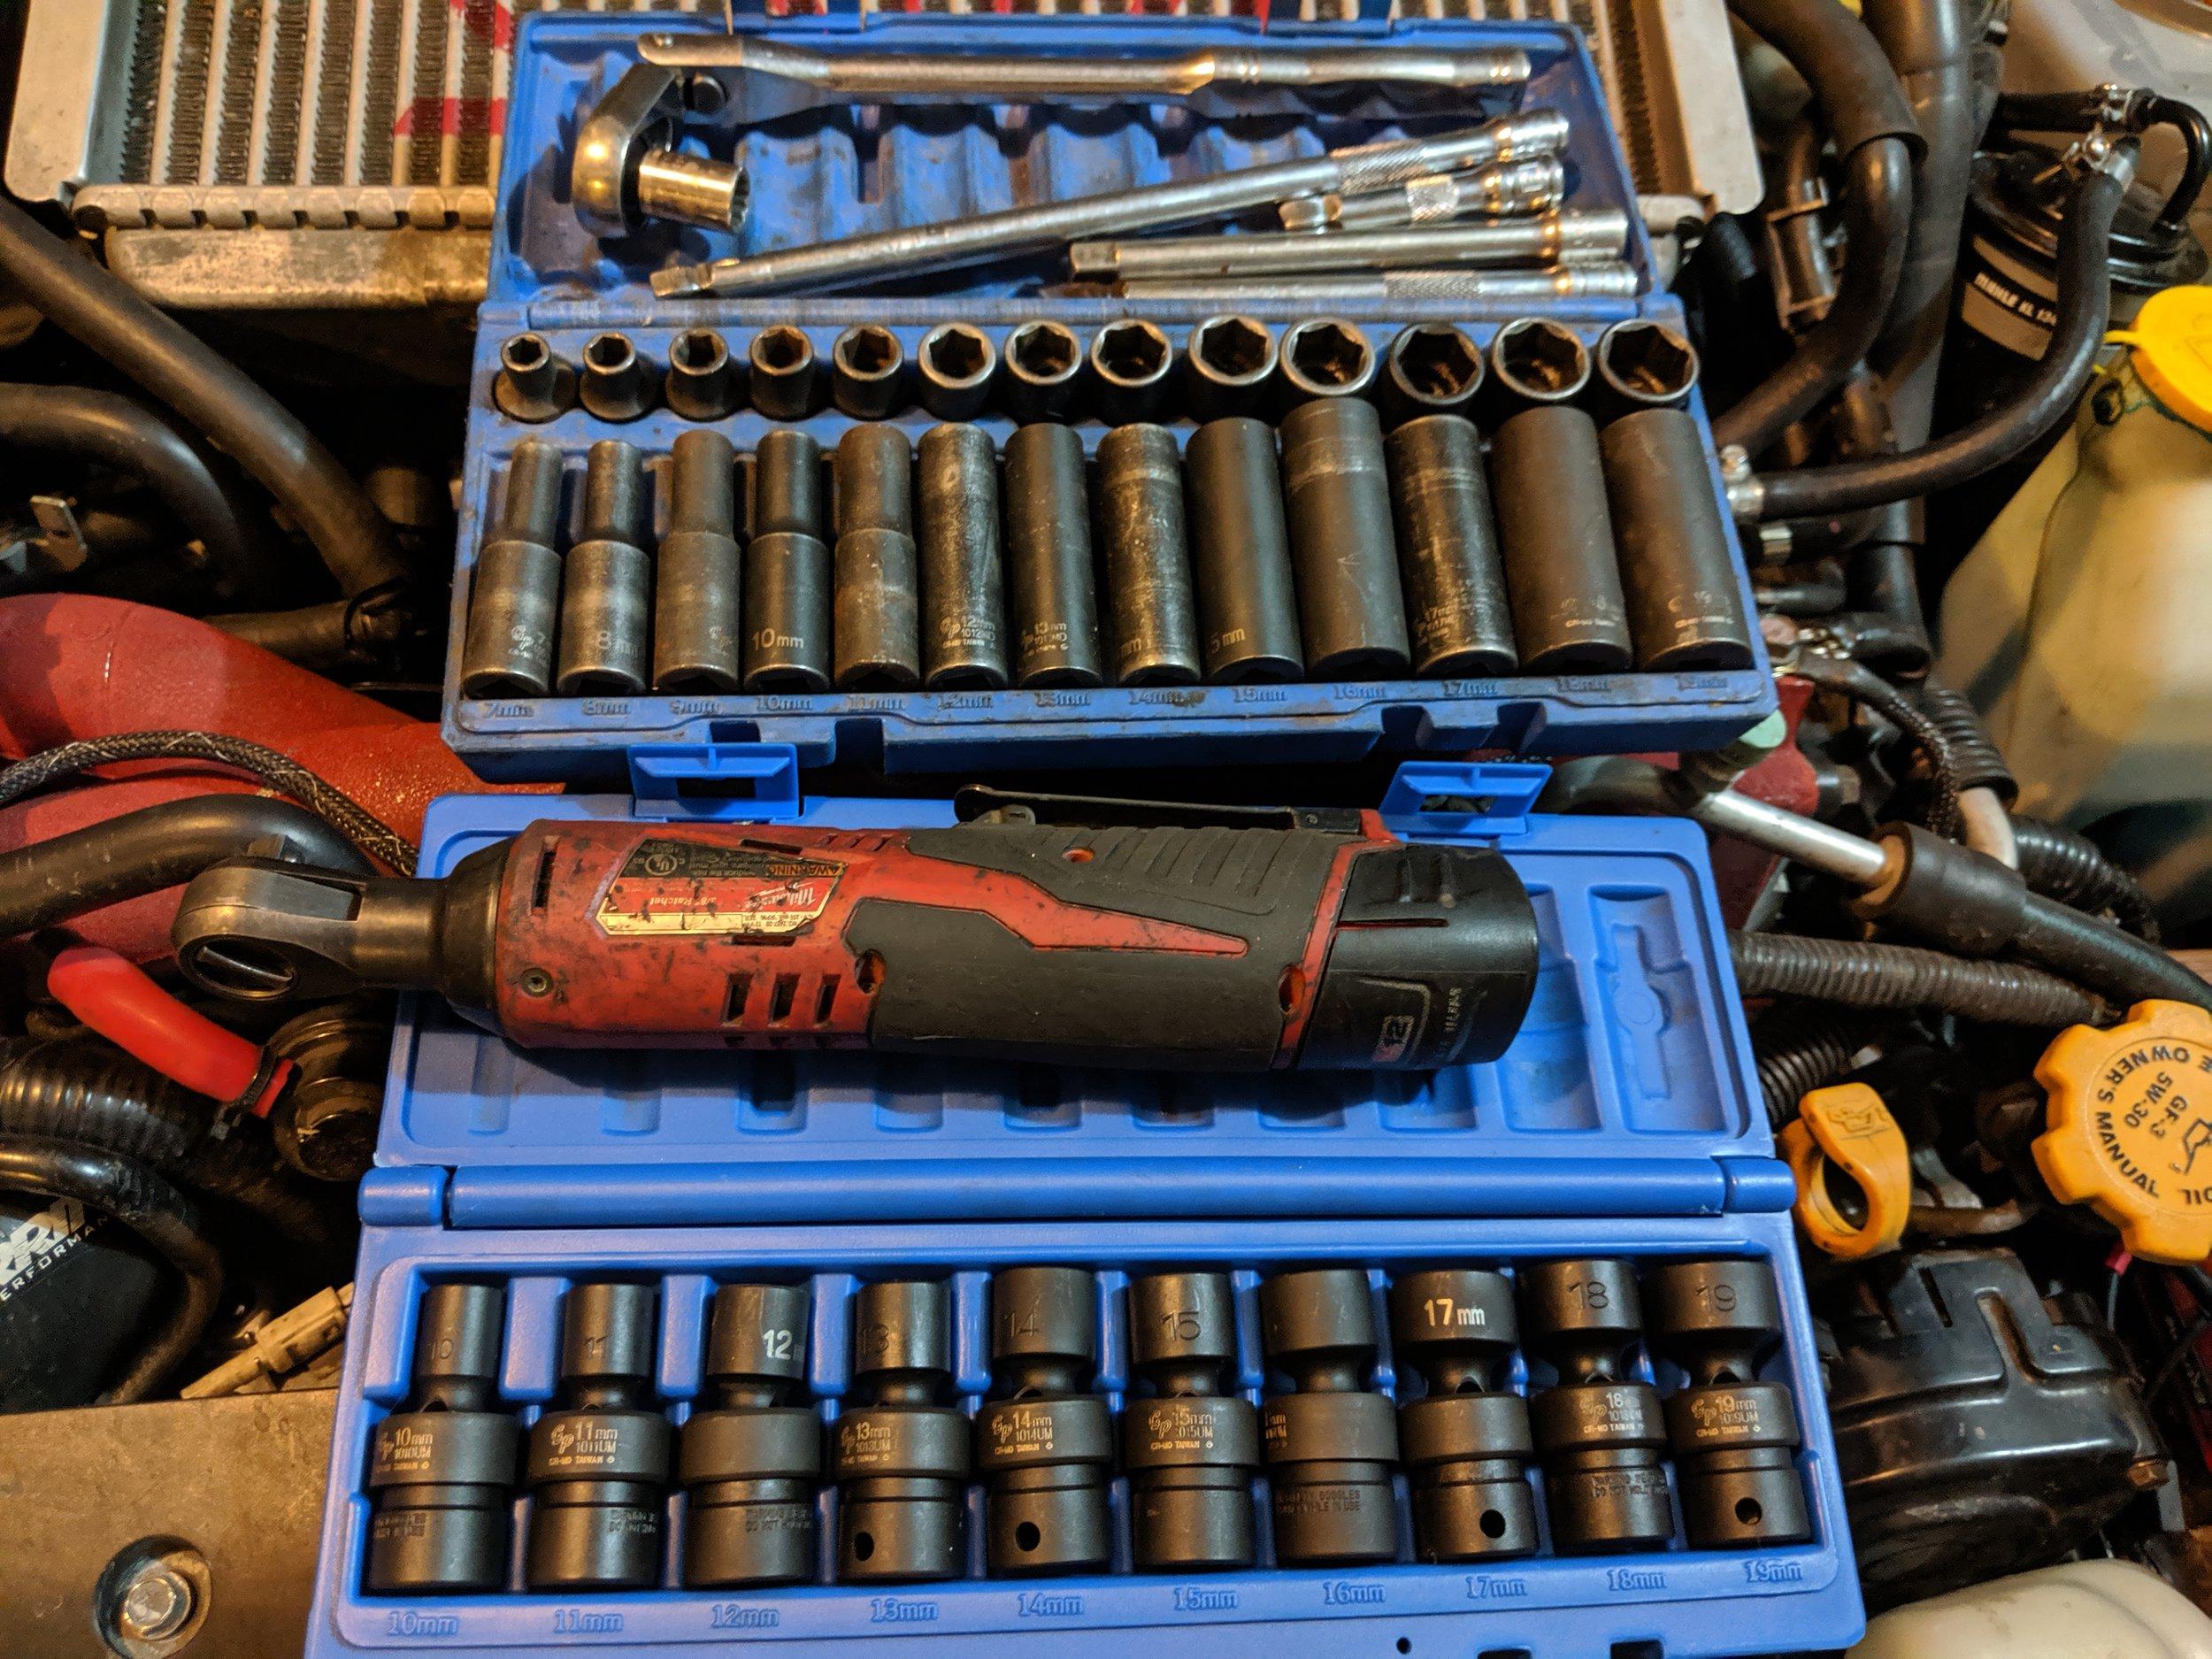 My favorite sockets always near by. Grey pneumatic wobble set and standard 3/8th set  Grey penumatic 3/8ths socket set  &  3/8th wobble socket set .